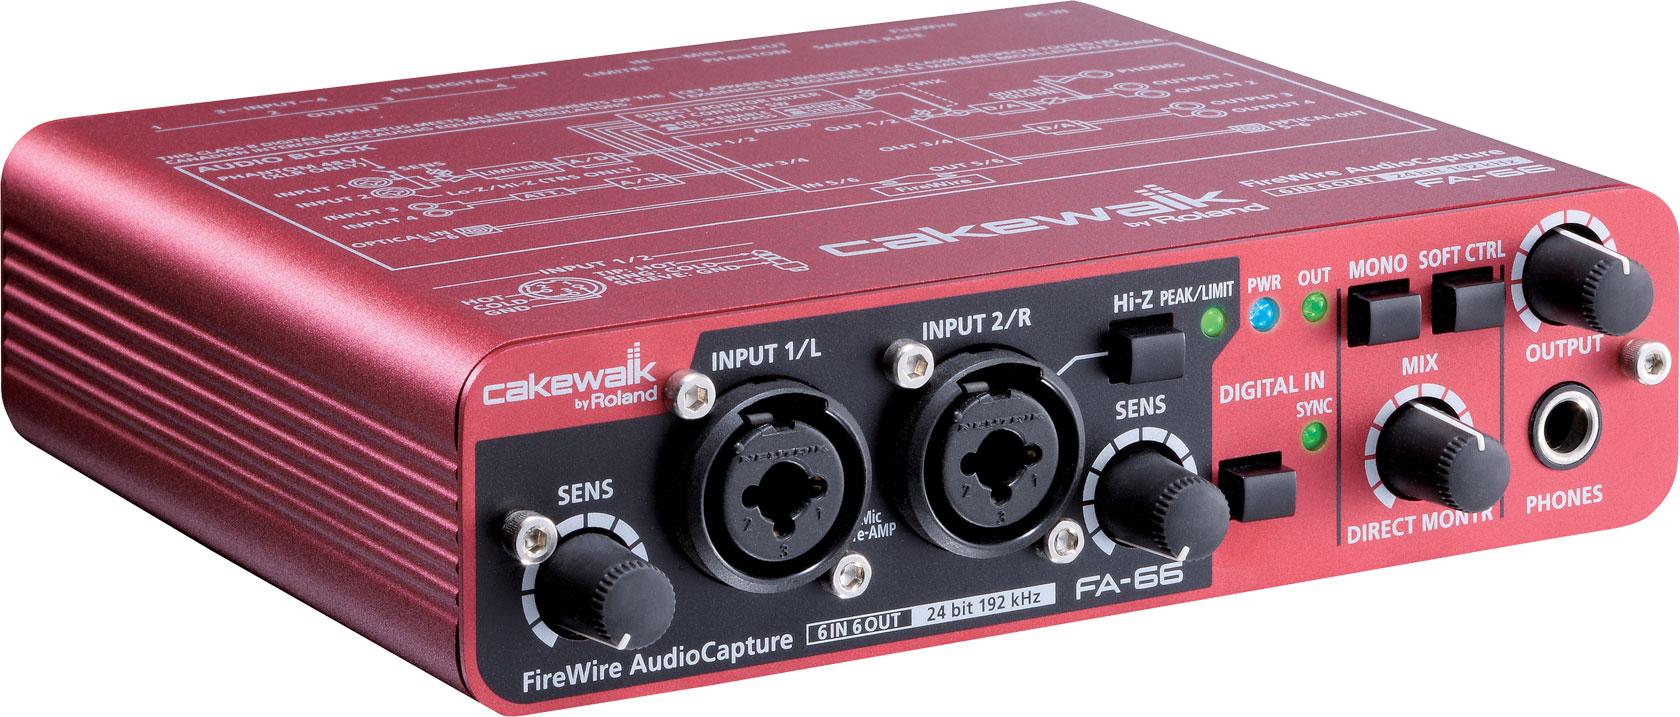 Roland - FA-66 | FireWire Audio Interface